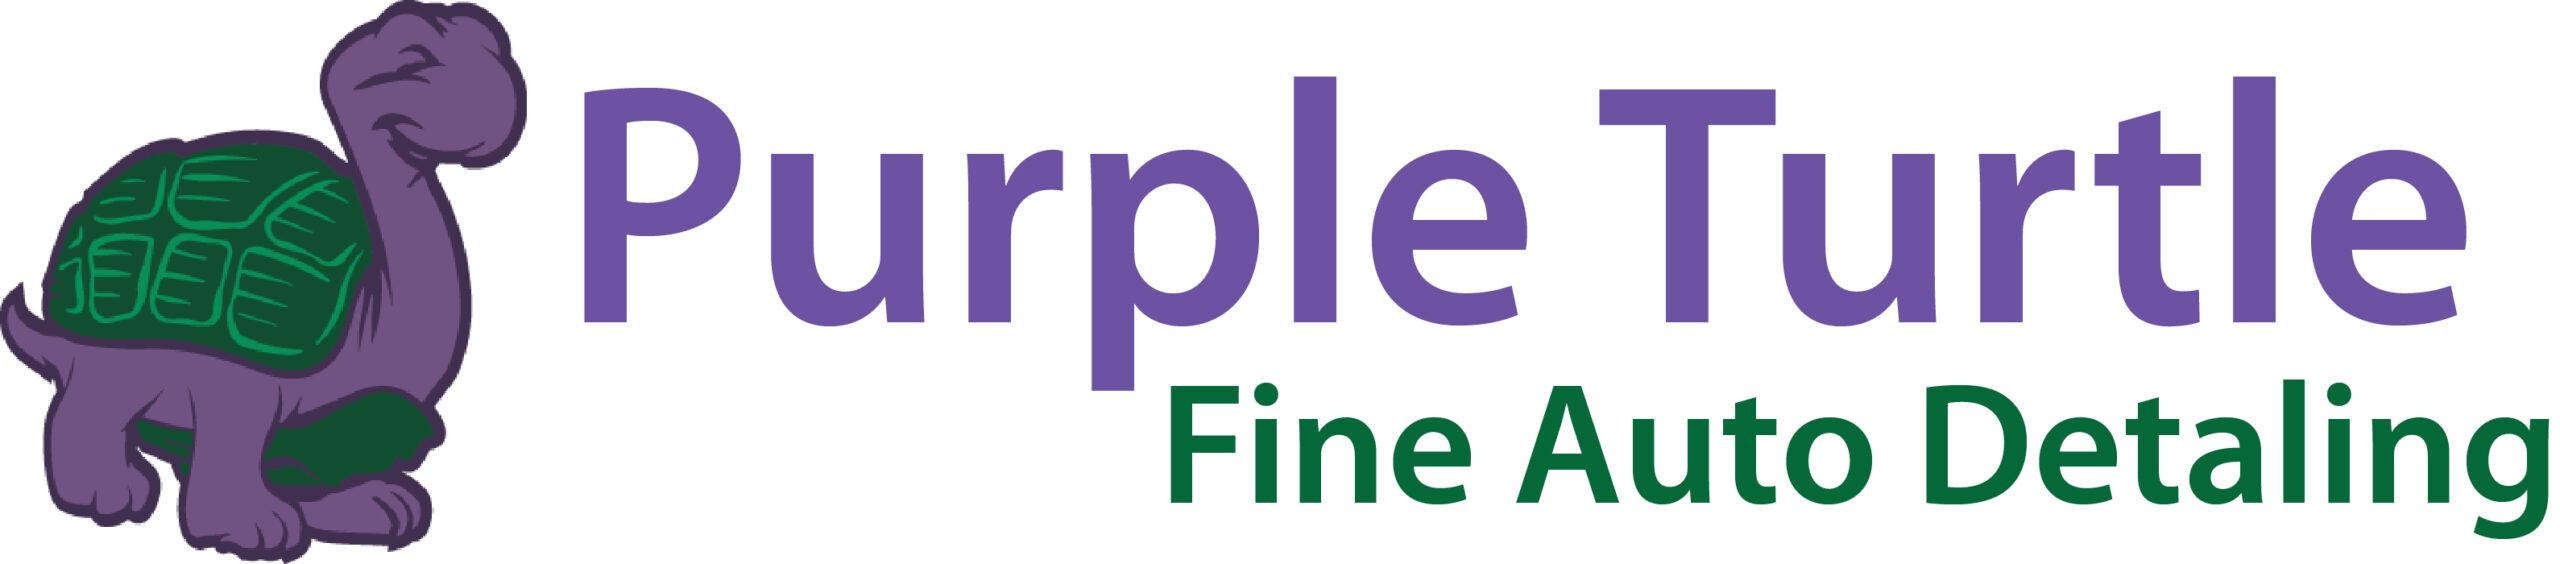 Purple Turtle Fine Auto Detailing